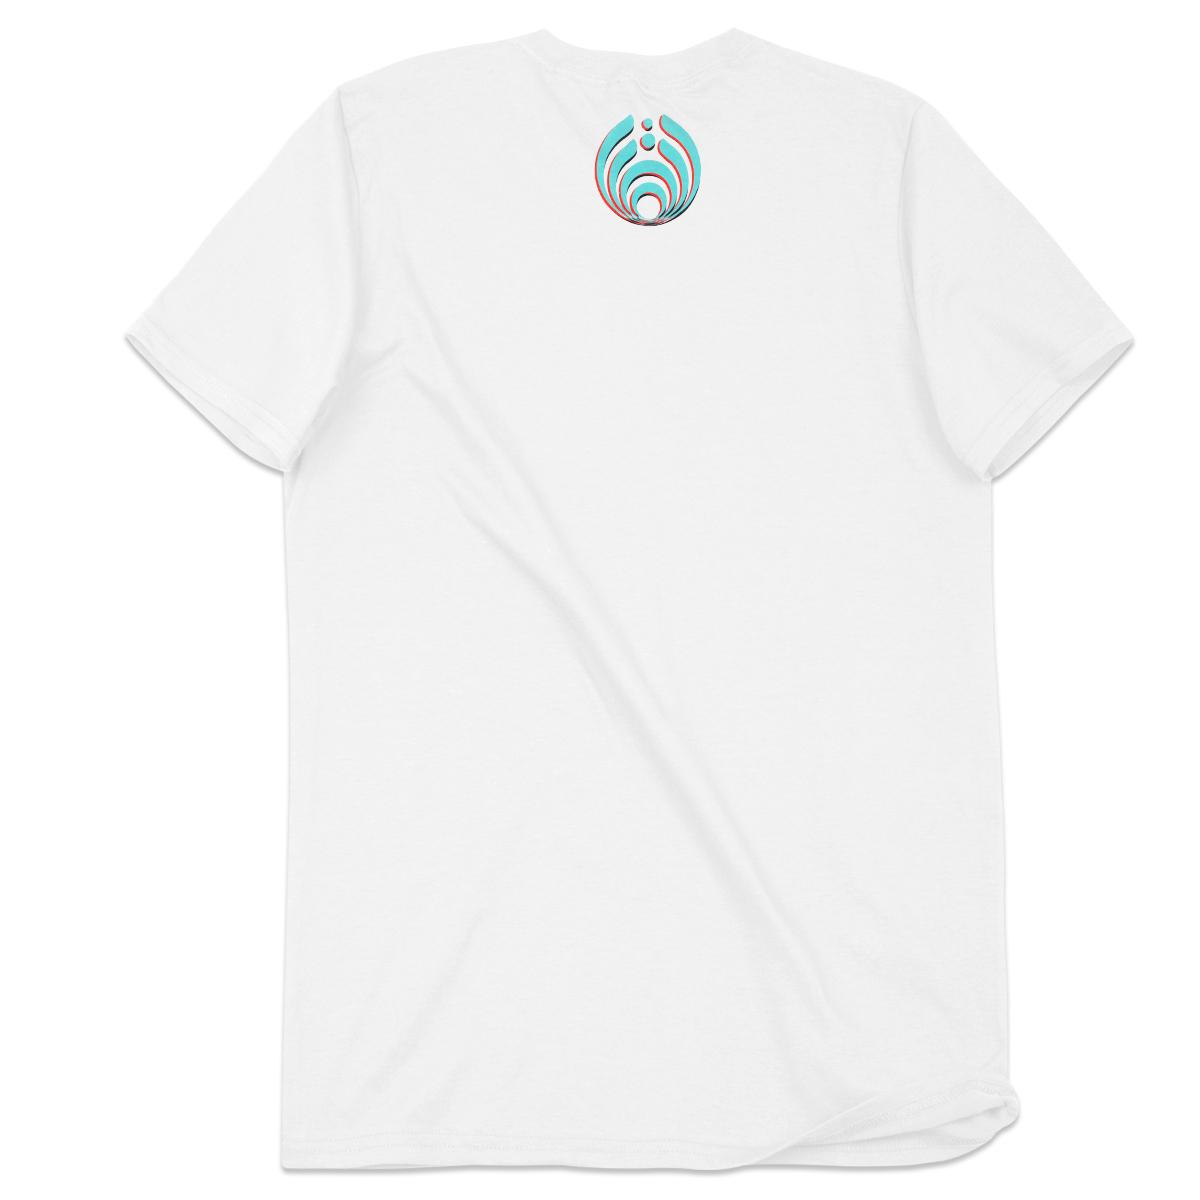 Bassnectar Into the Sun T-Shirt - White